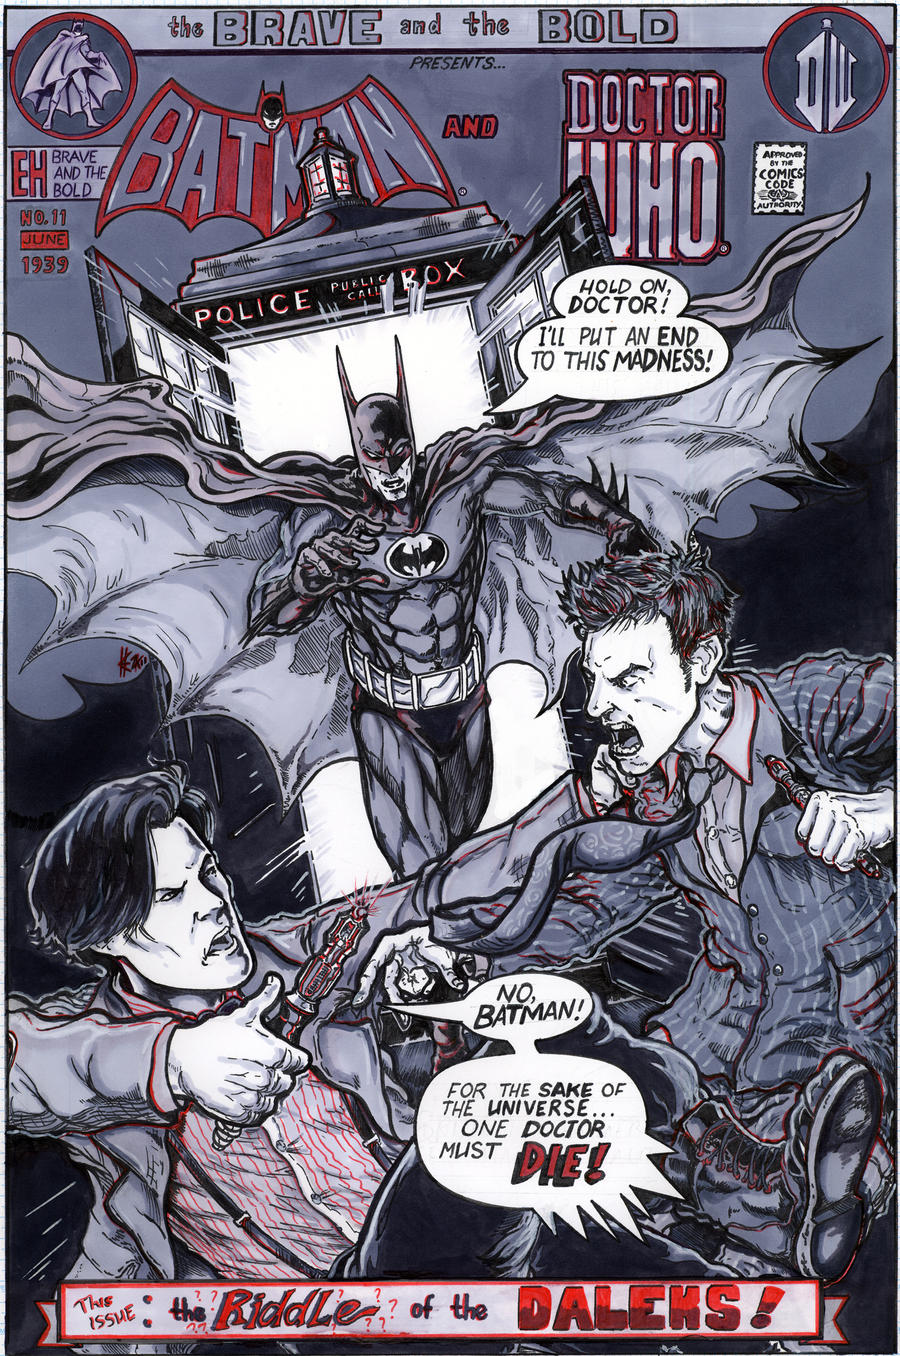 Batman and Doctor Who by ElvinHernandez